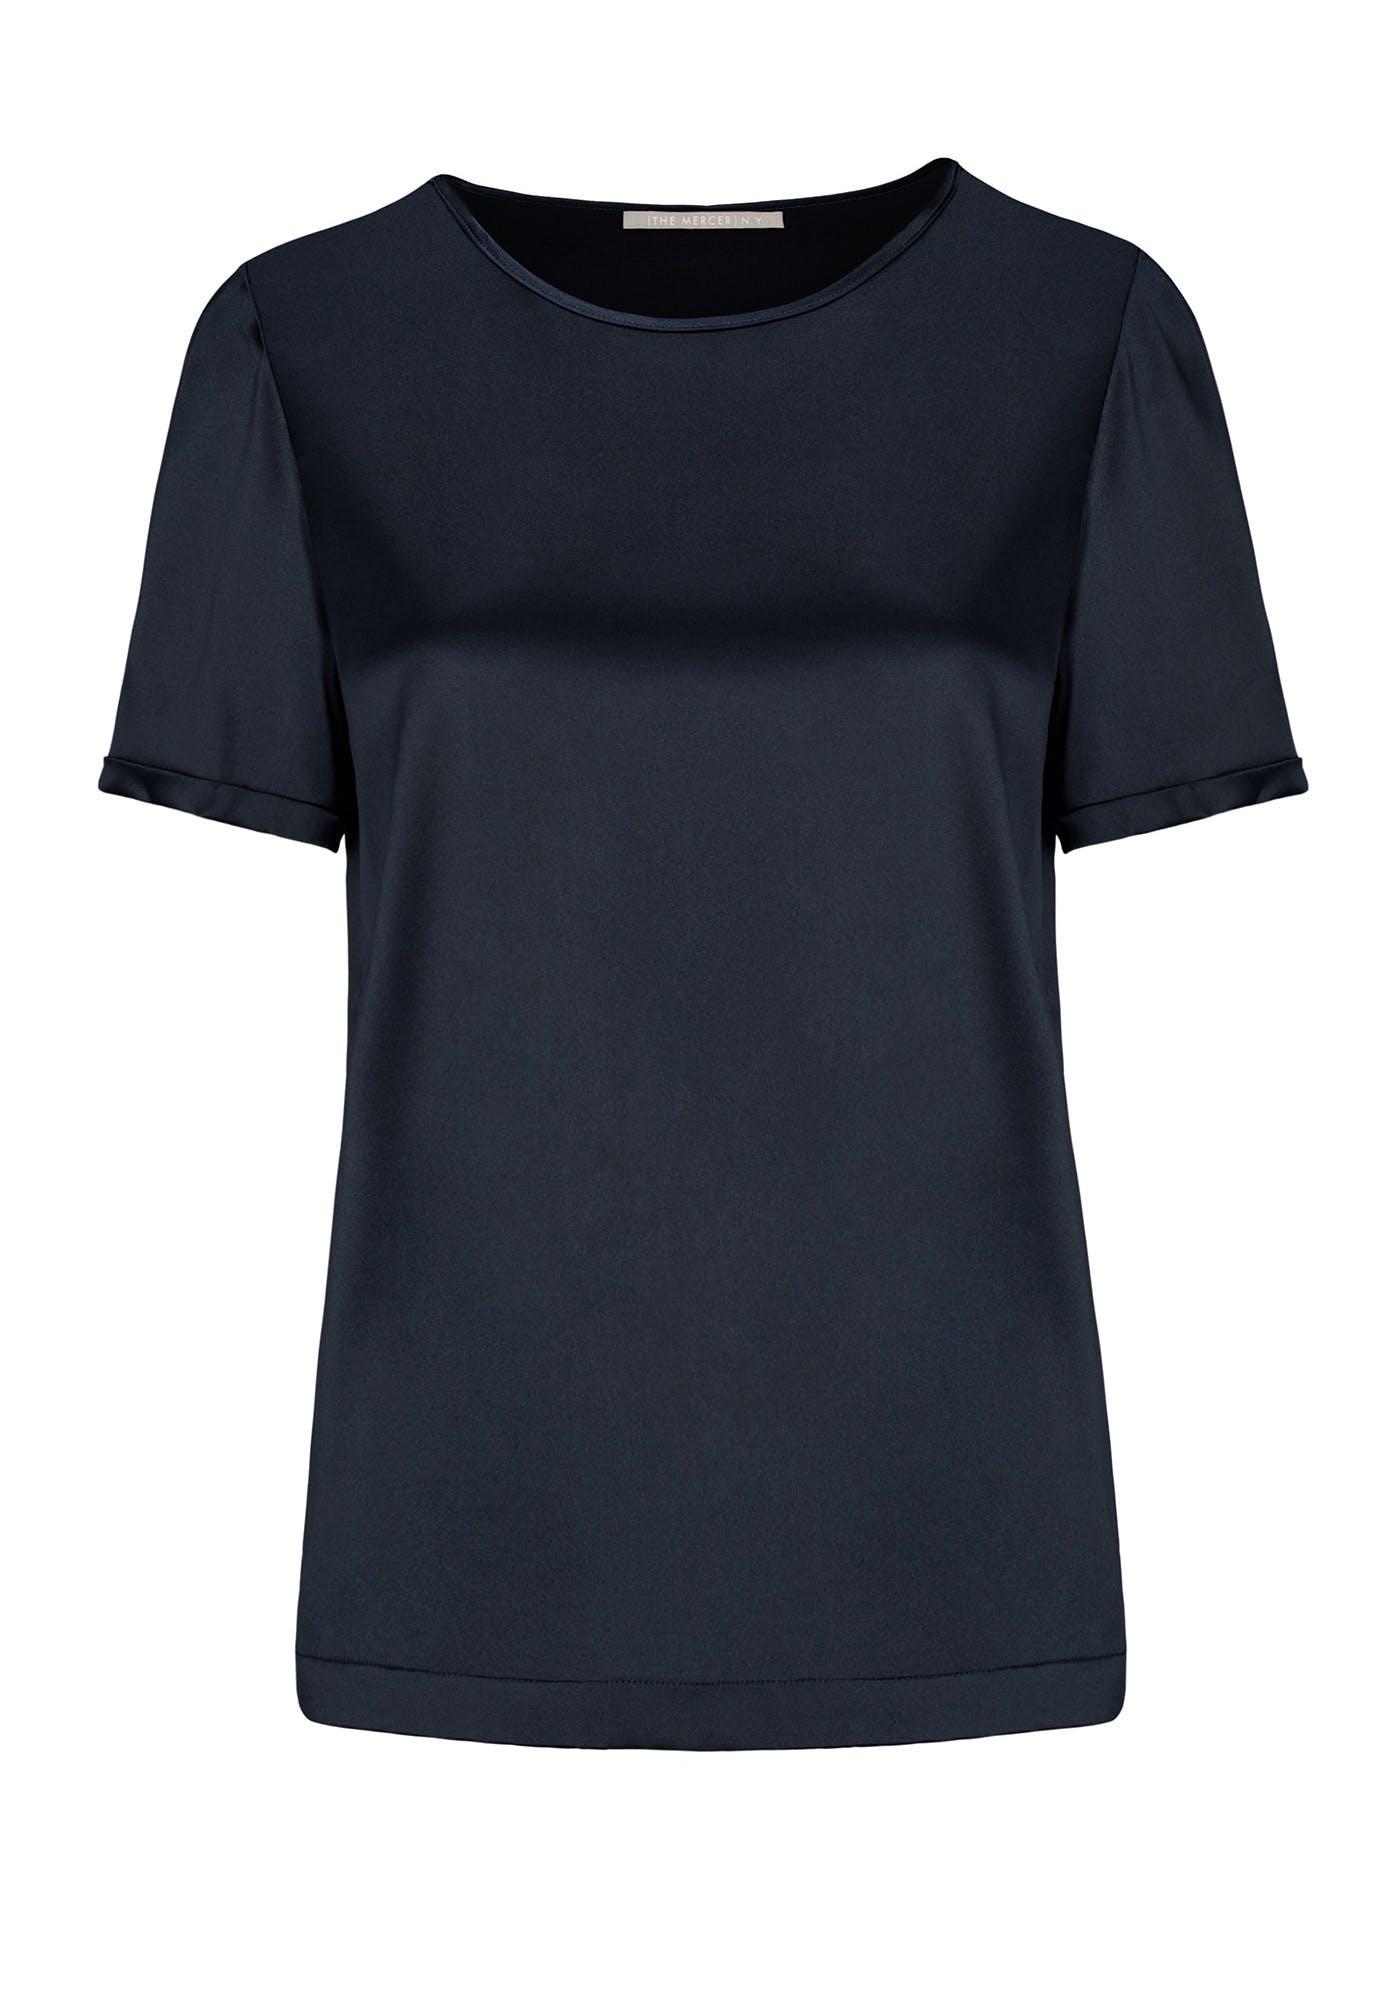 Satinsilk Shirt mit feinem Umschlag am Ärmelsaum - Navy